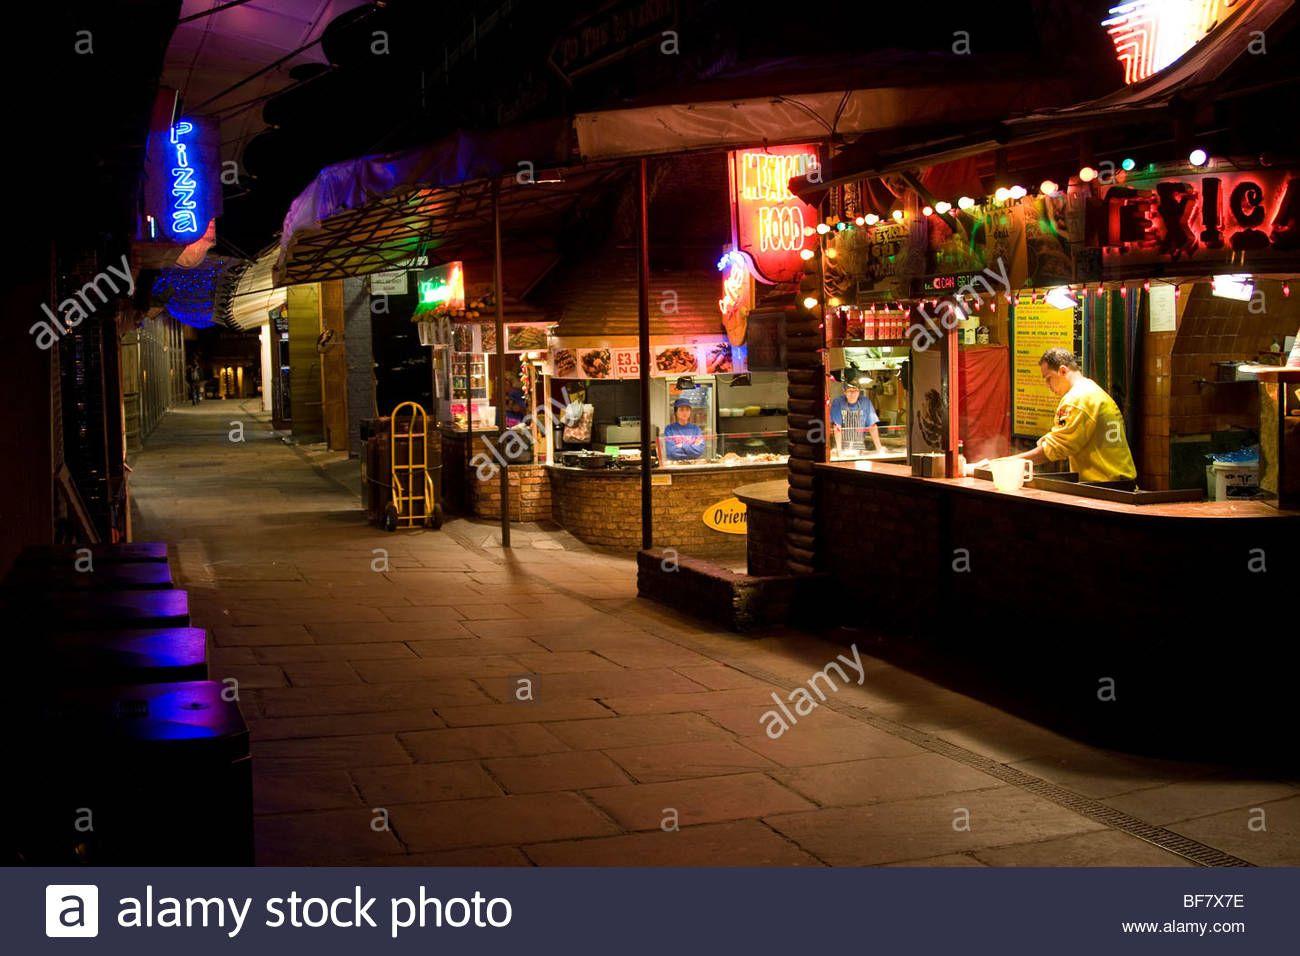 http://c8.alamy.com/comp/BF7X7E/night-scene-camden-town-london-england-uk-europe-BF7X7E.jpg